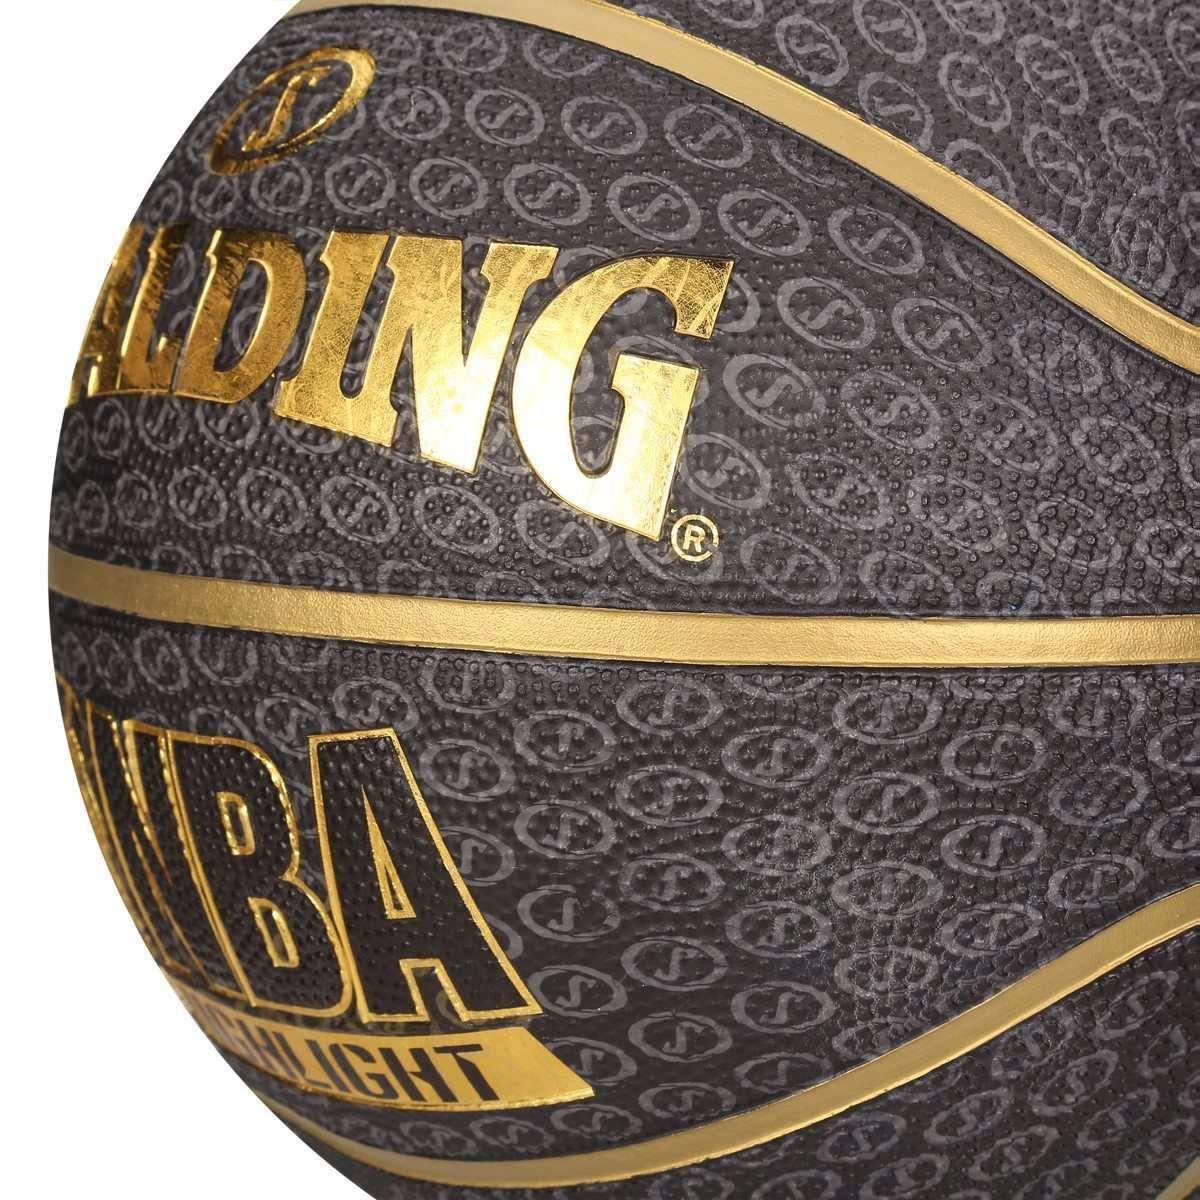 bola basquete spalding highlight nba oficial. Carregando zoom. 1b8c7c57eb8f8